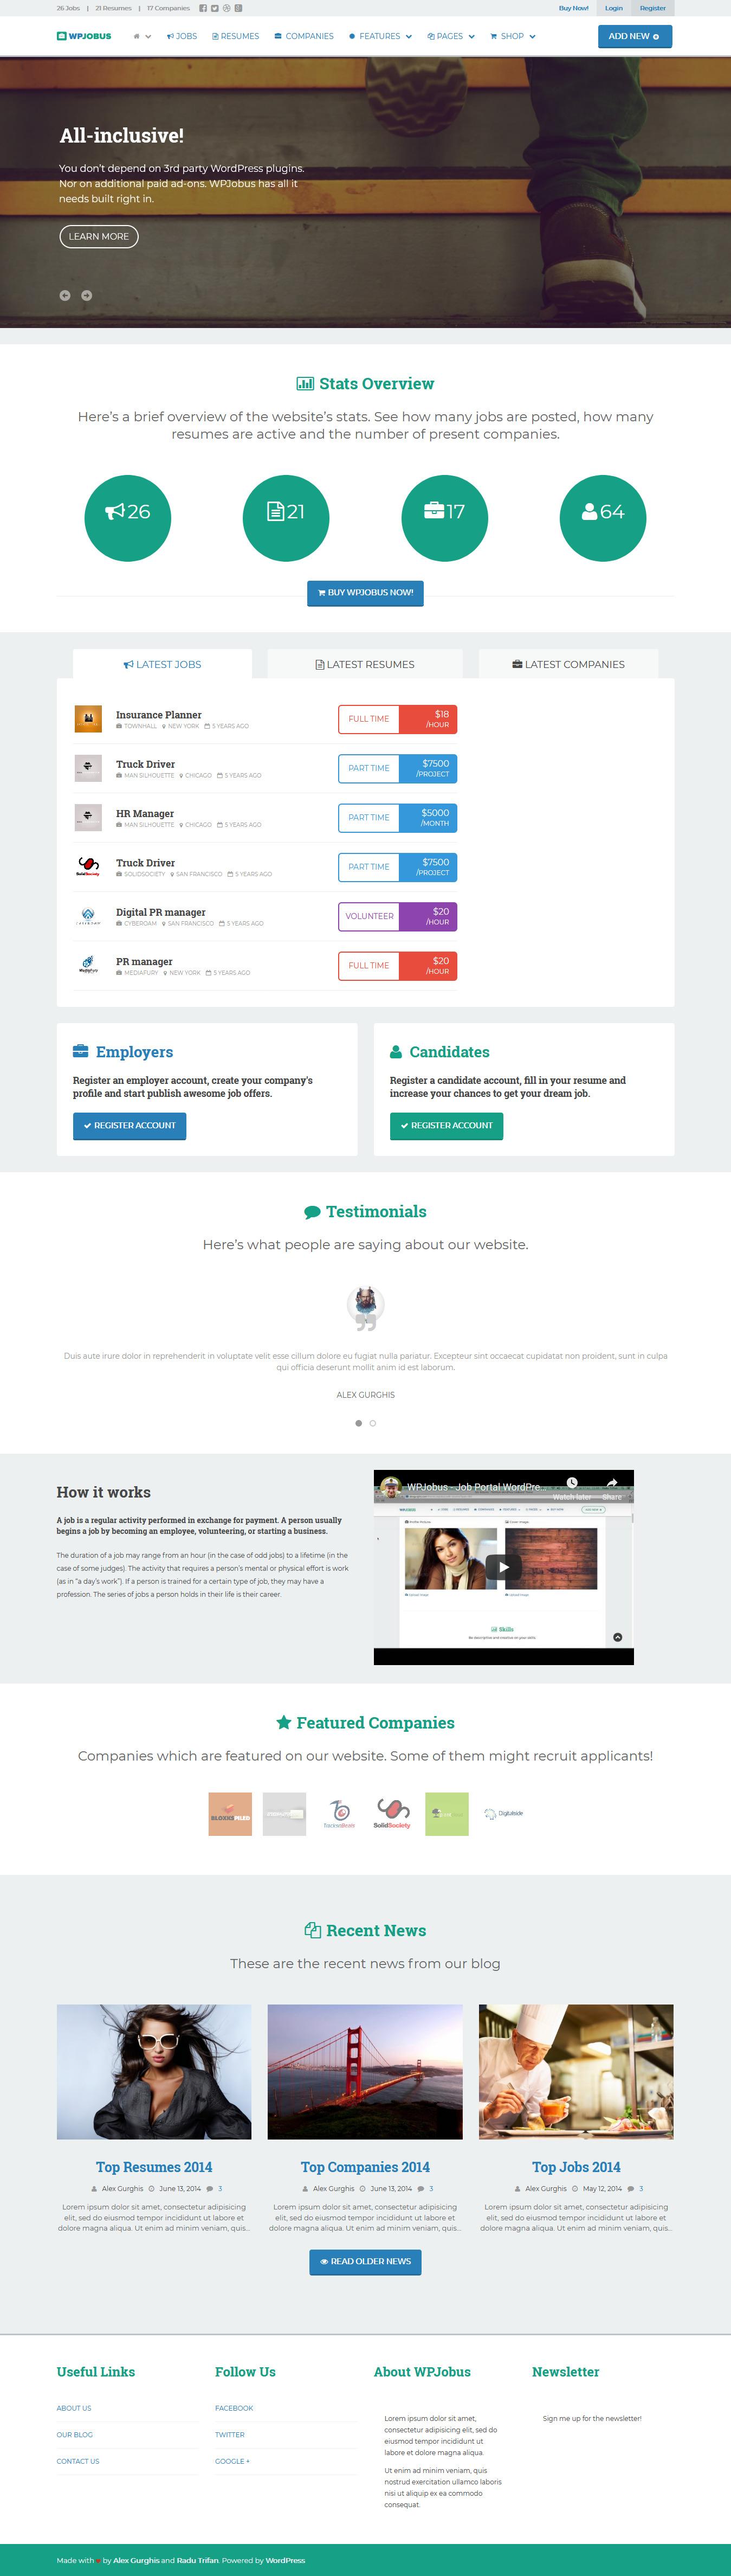 WPJobus - Best Premium Resume WordPress Theme